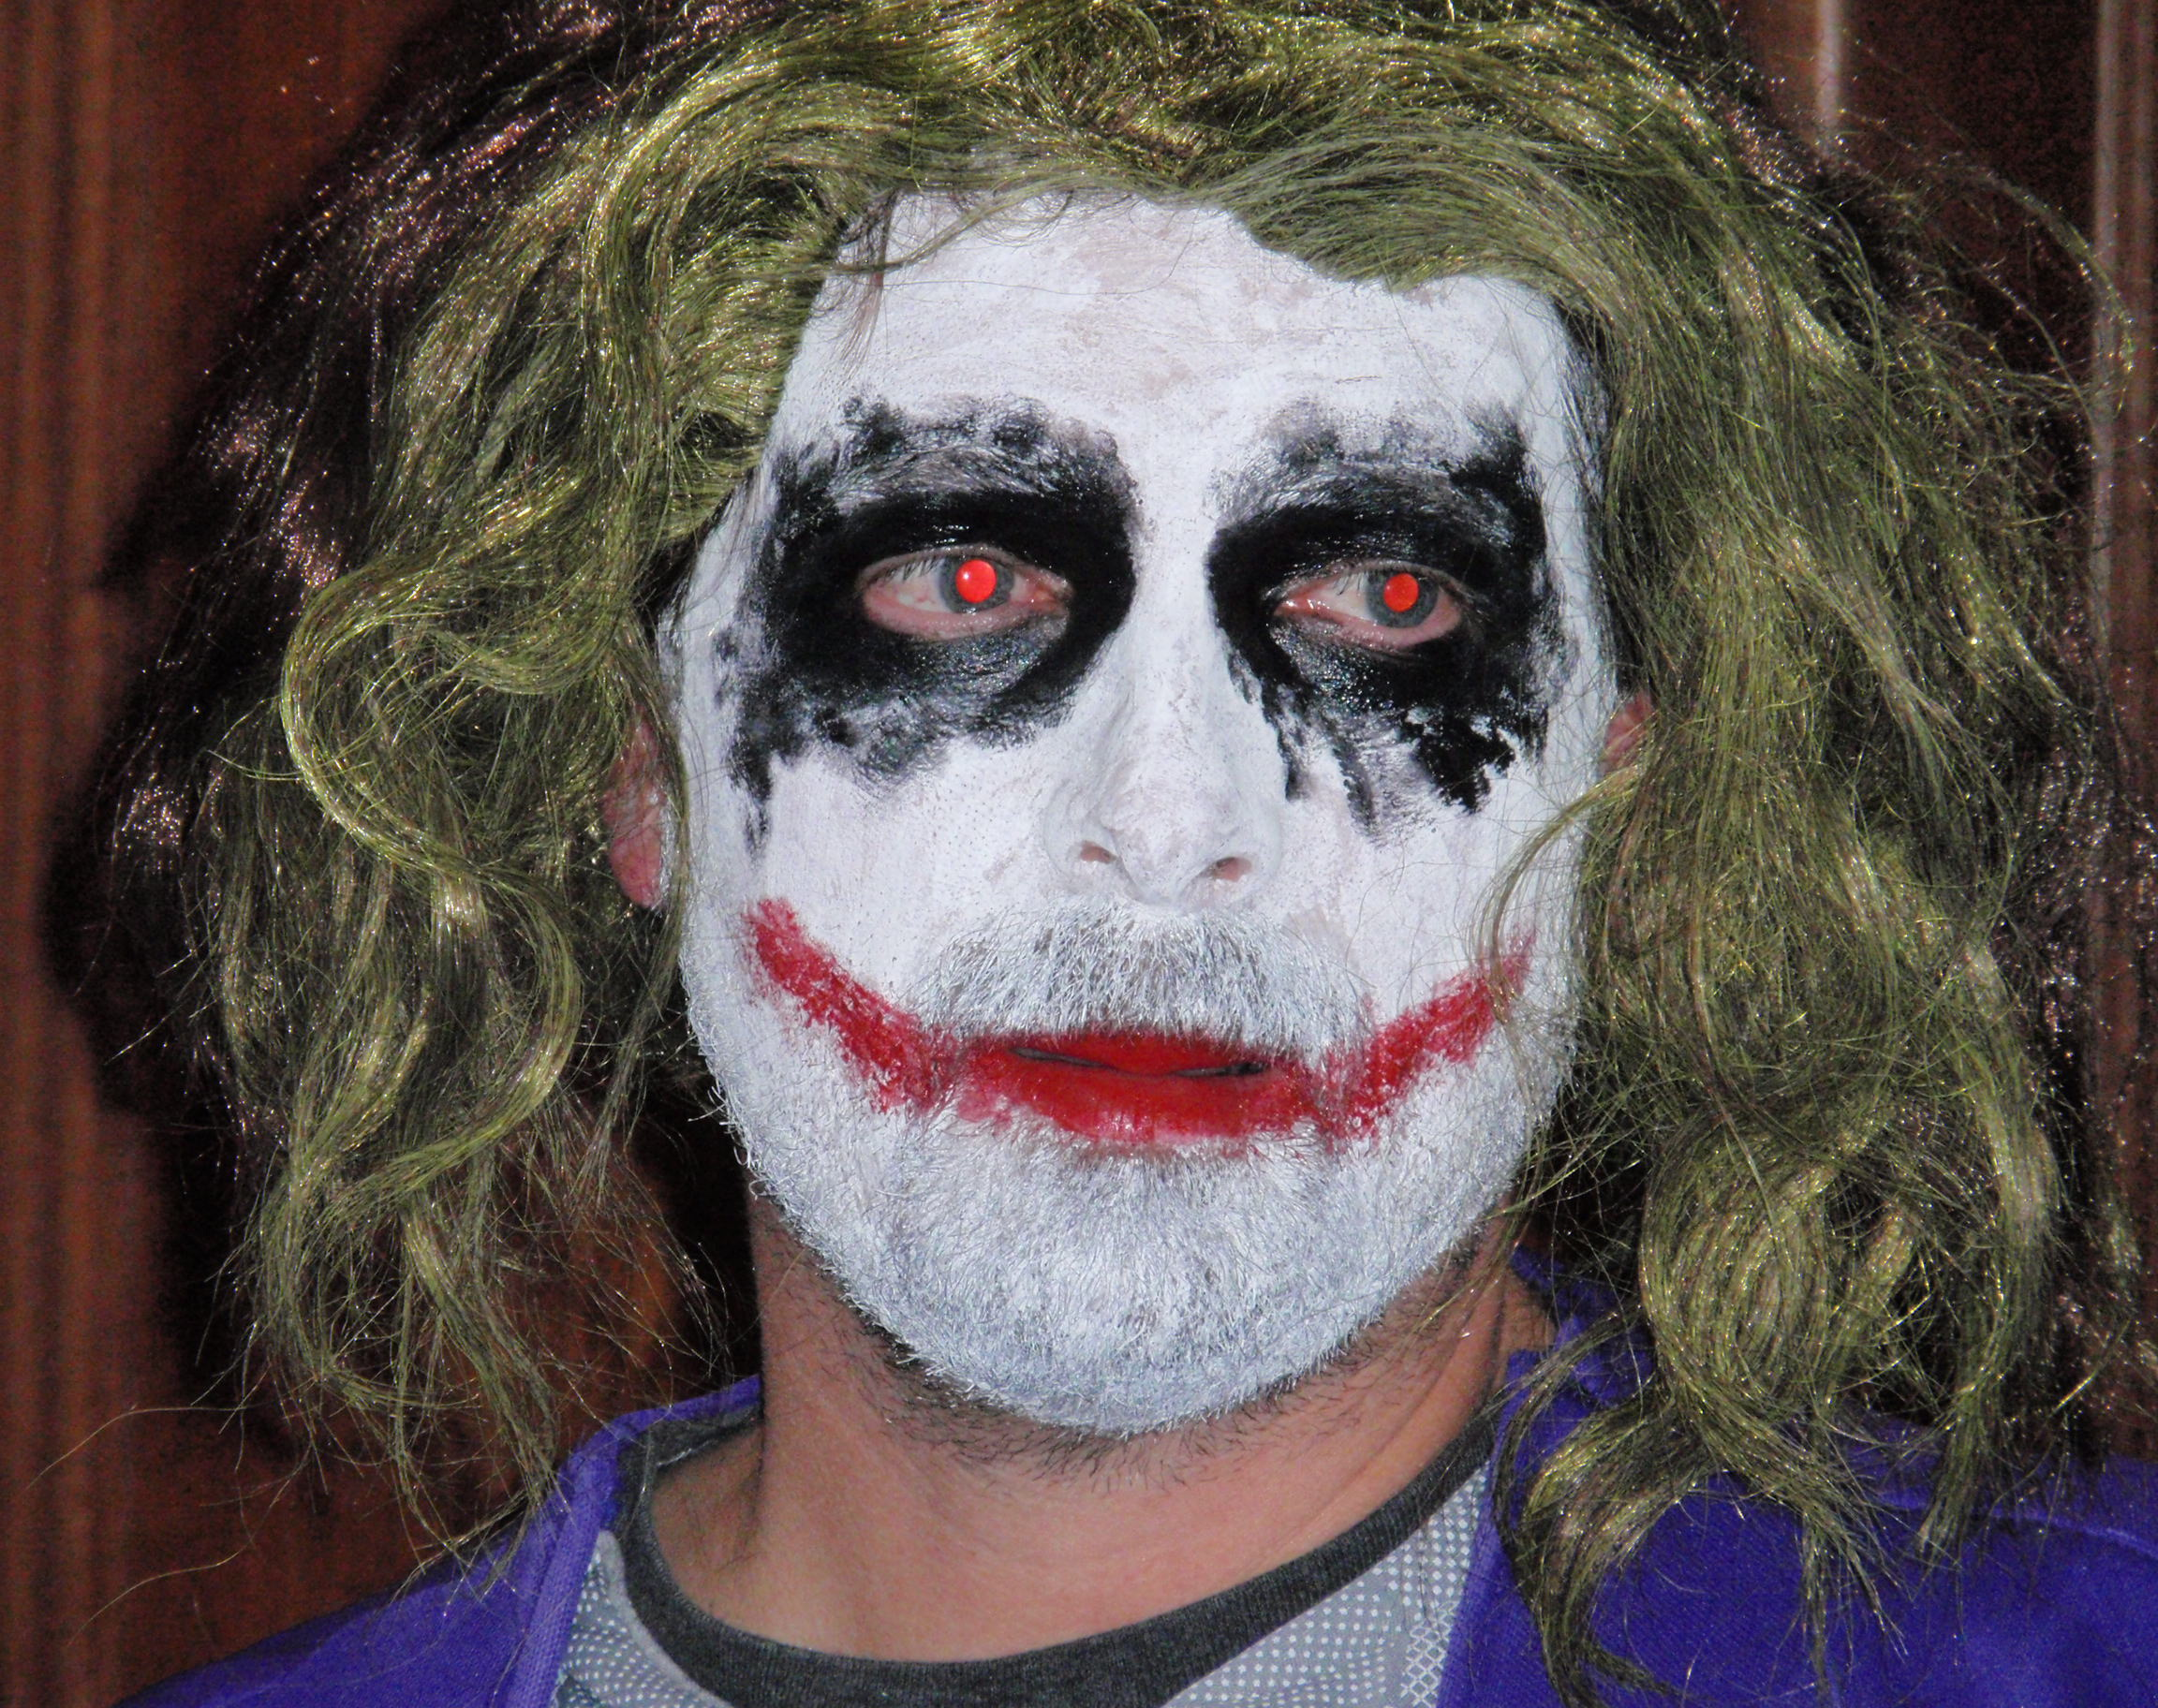 big brother joker